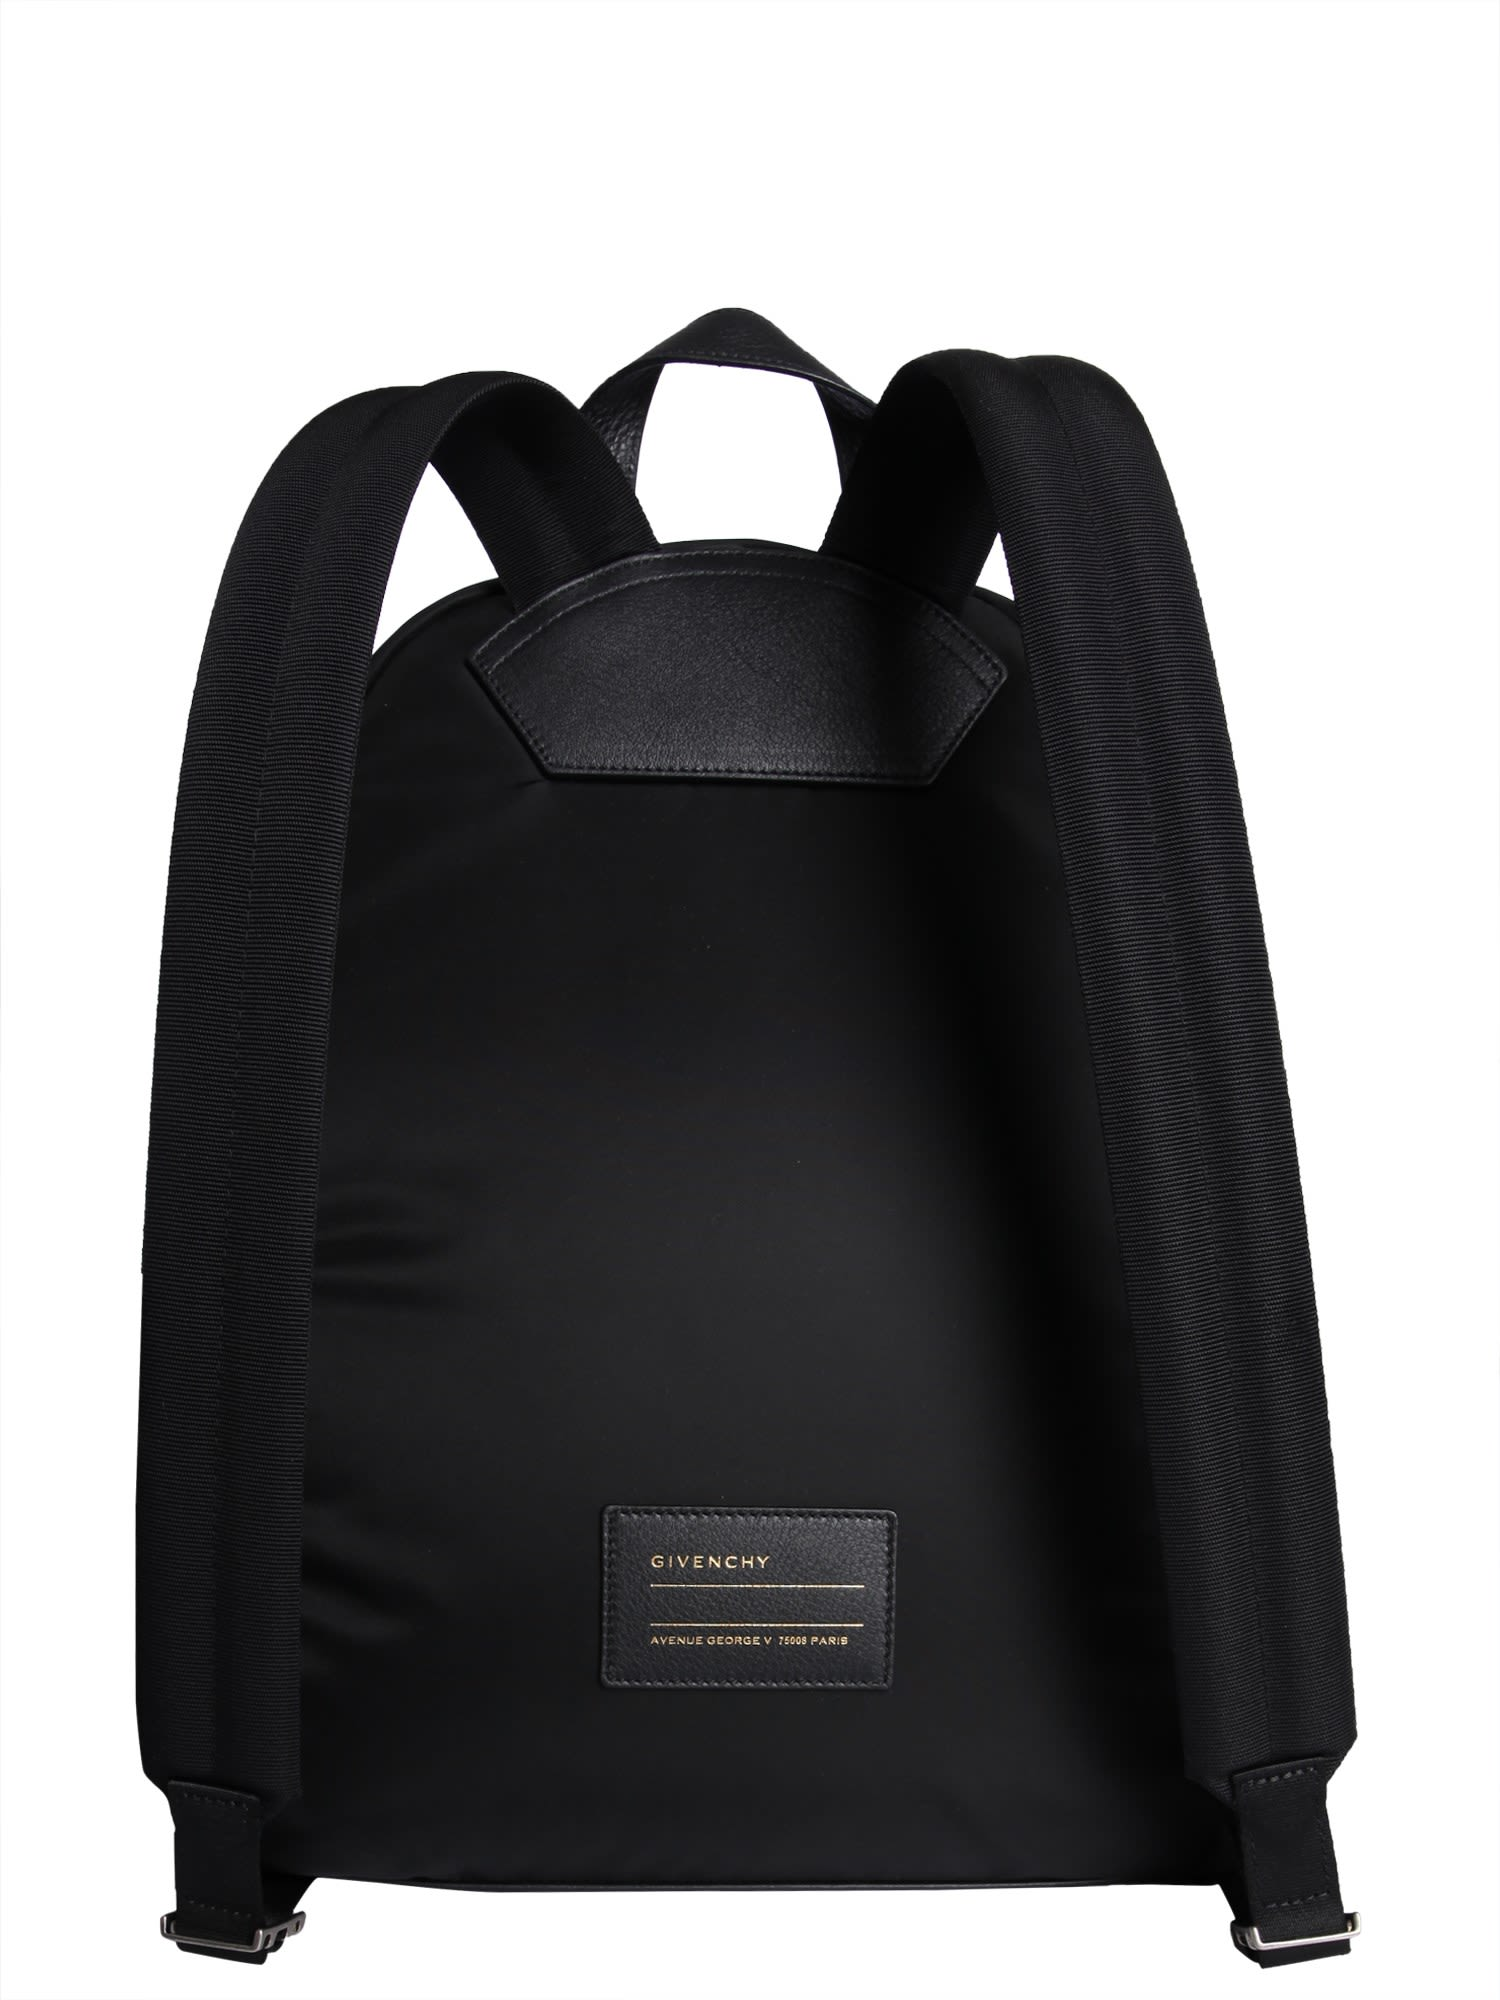 7b535380e62c Givenchy Givenchy Givenchy Paris Backpack - NERO - 10797041